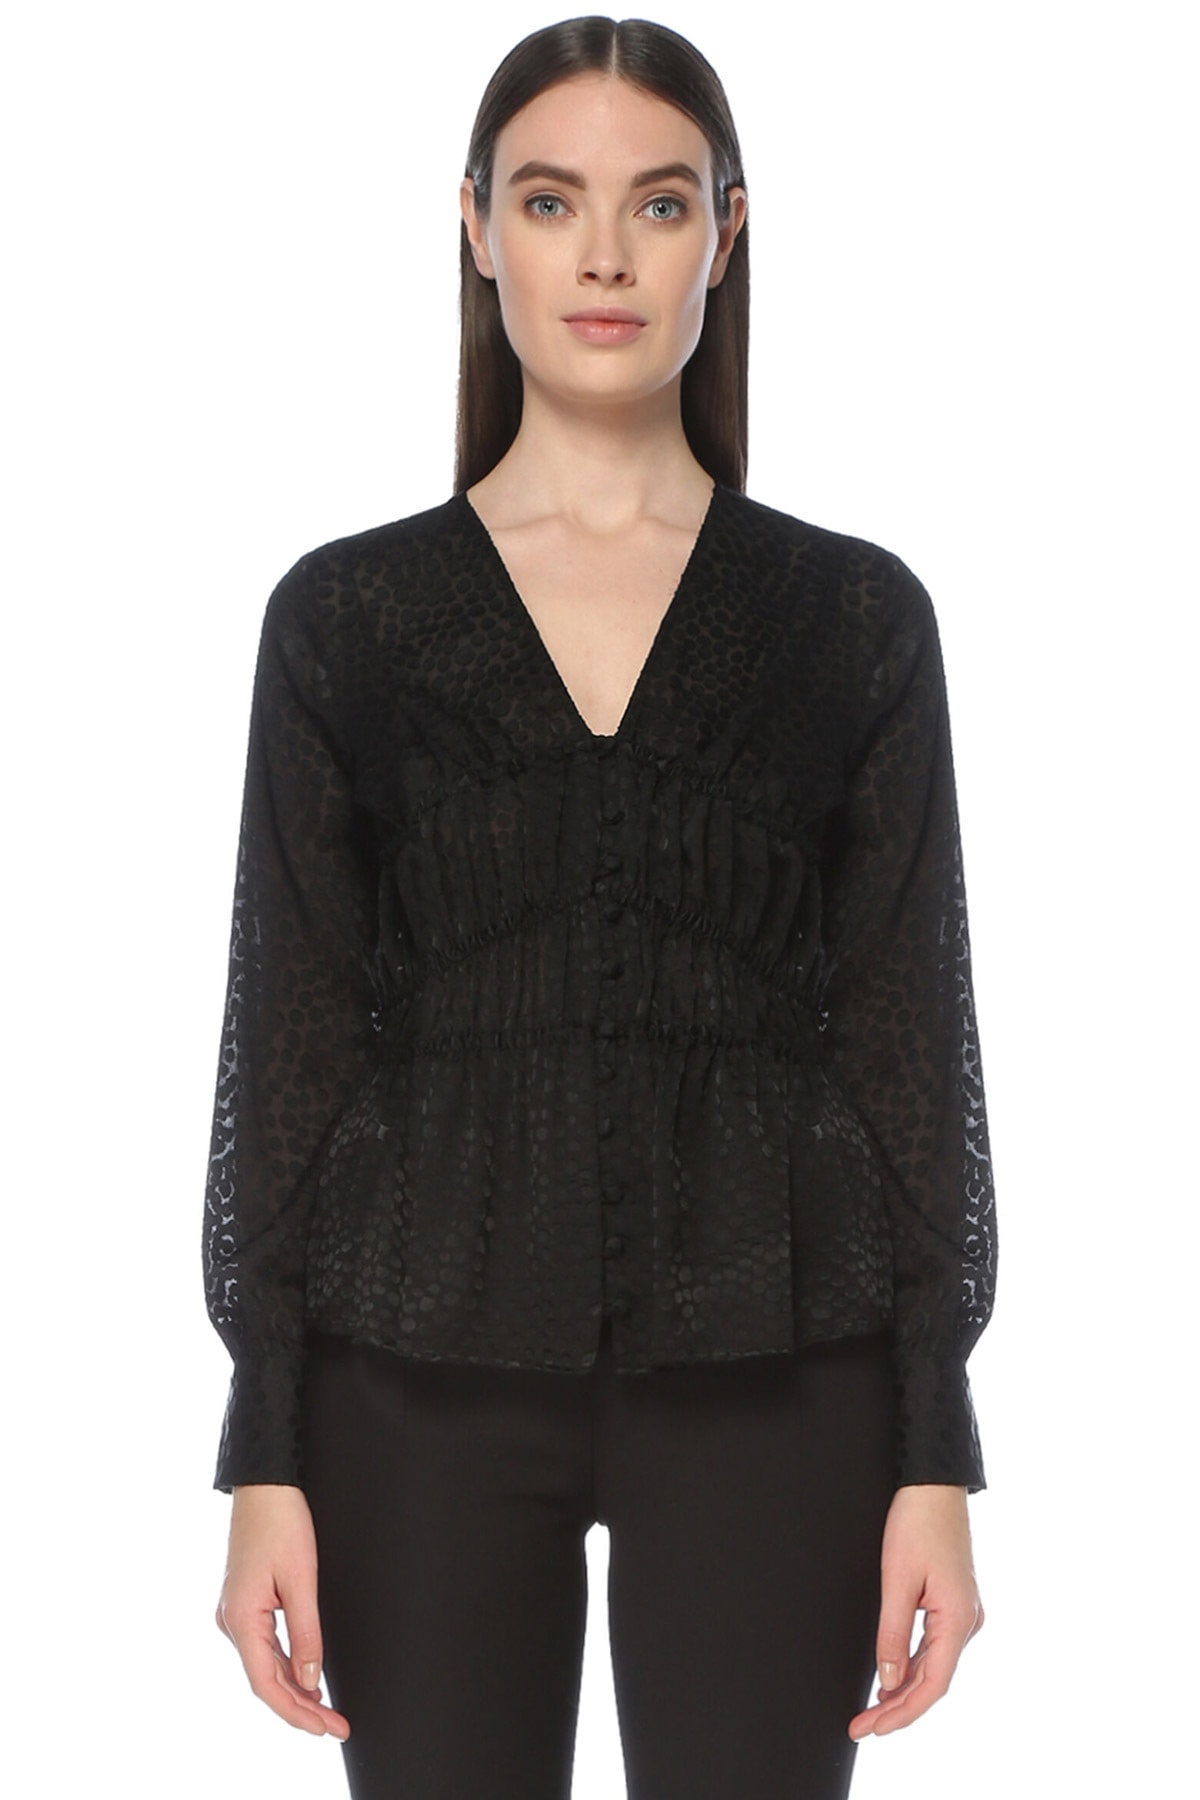 Kadın Siyah Siyah V Yaka Desenli Gömlek 1076342